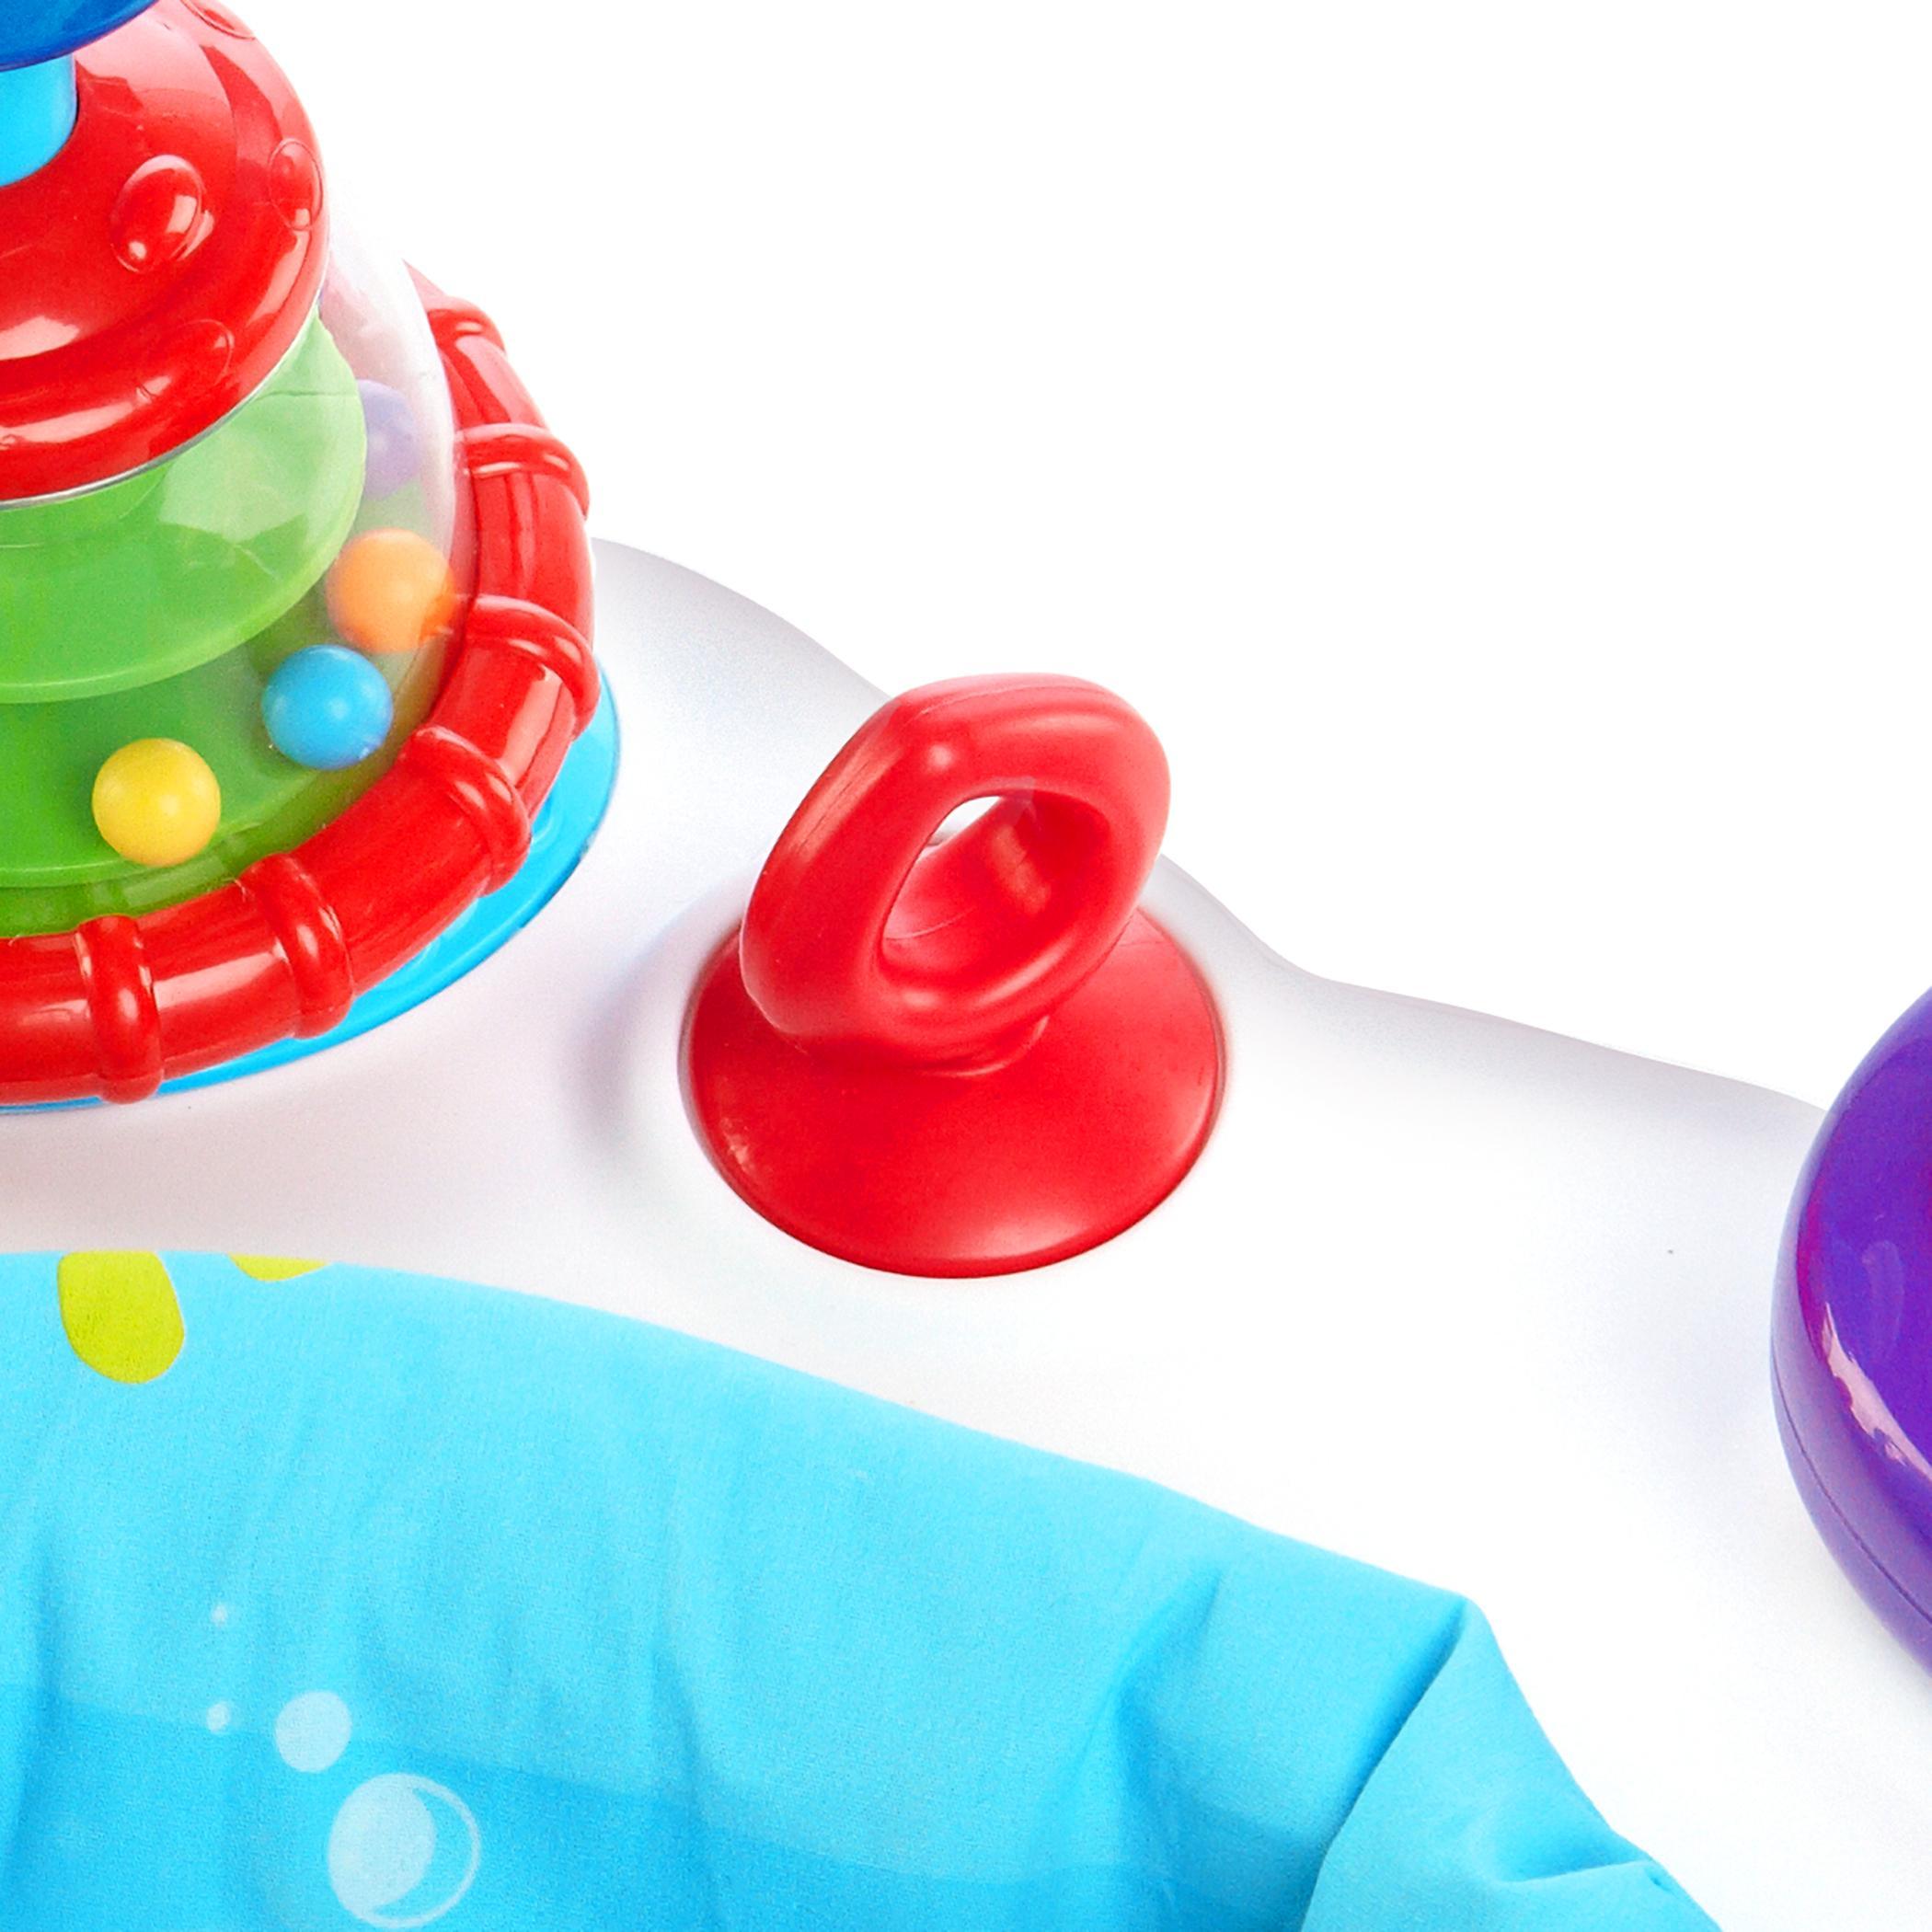 New Rhythm Of The Reef Activity Saucer W 12 Fun Activities By Baby Einstein